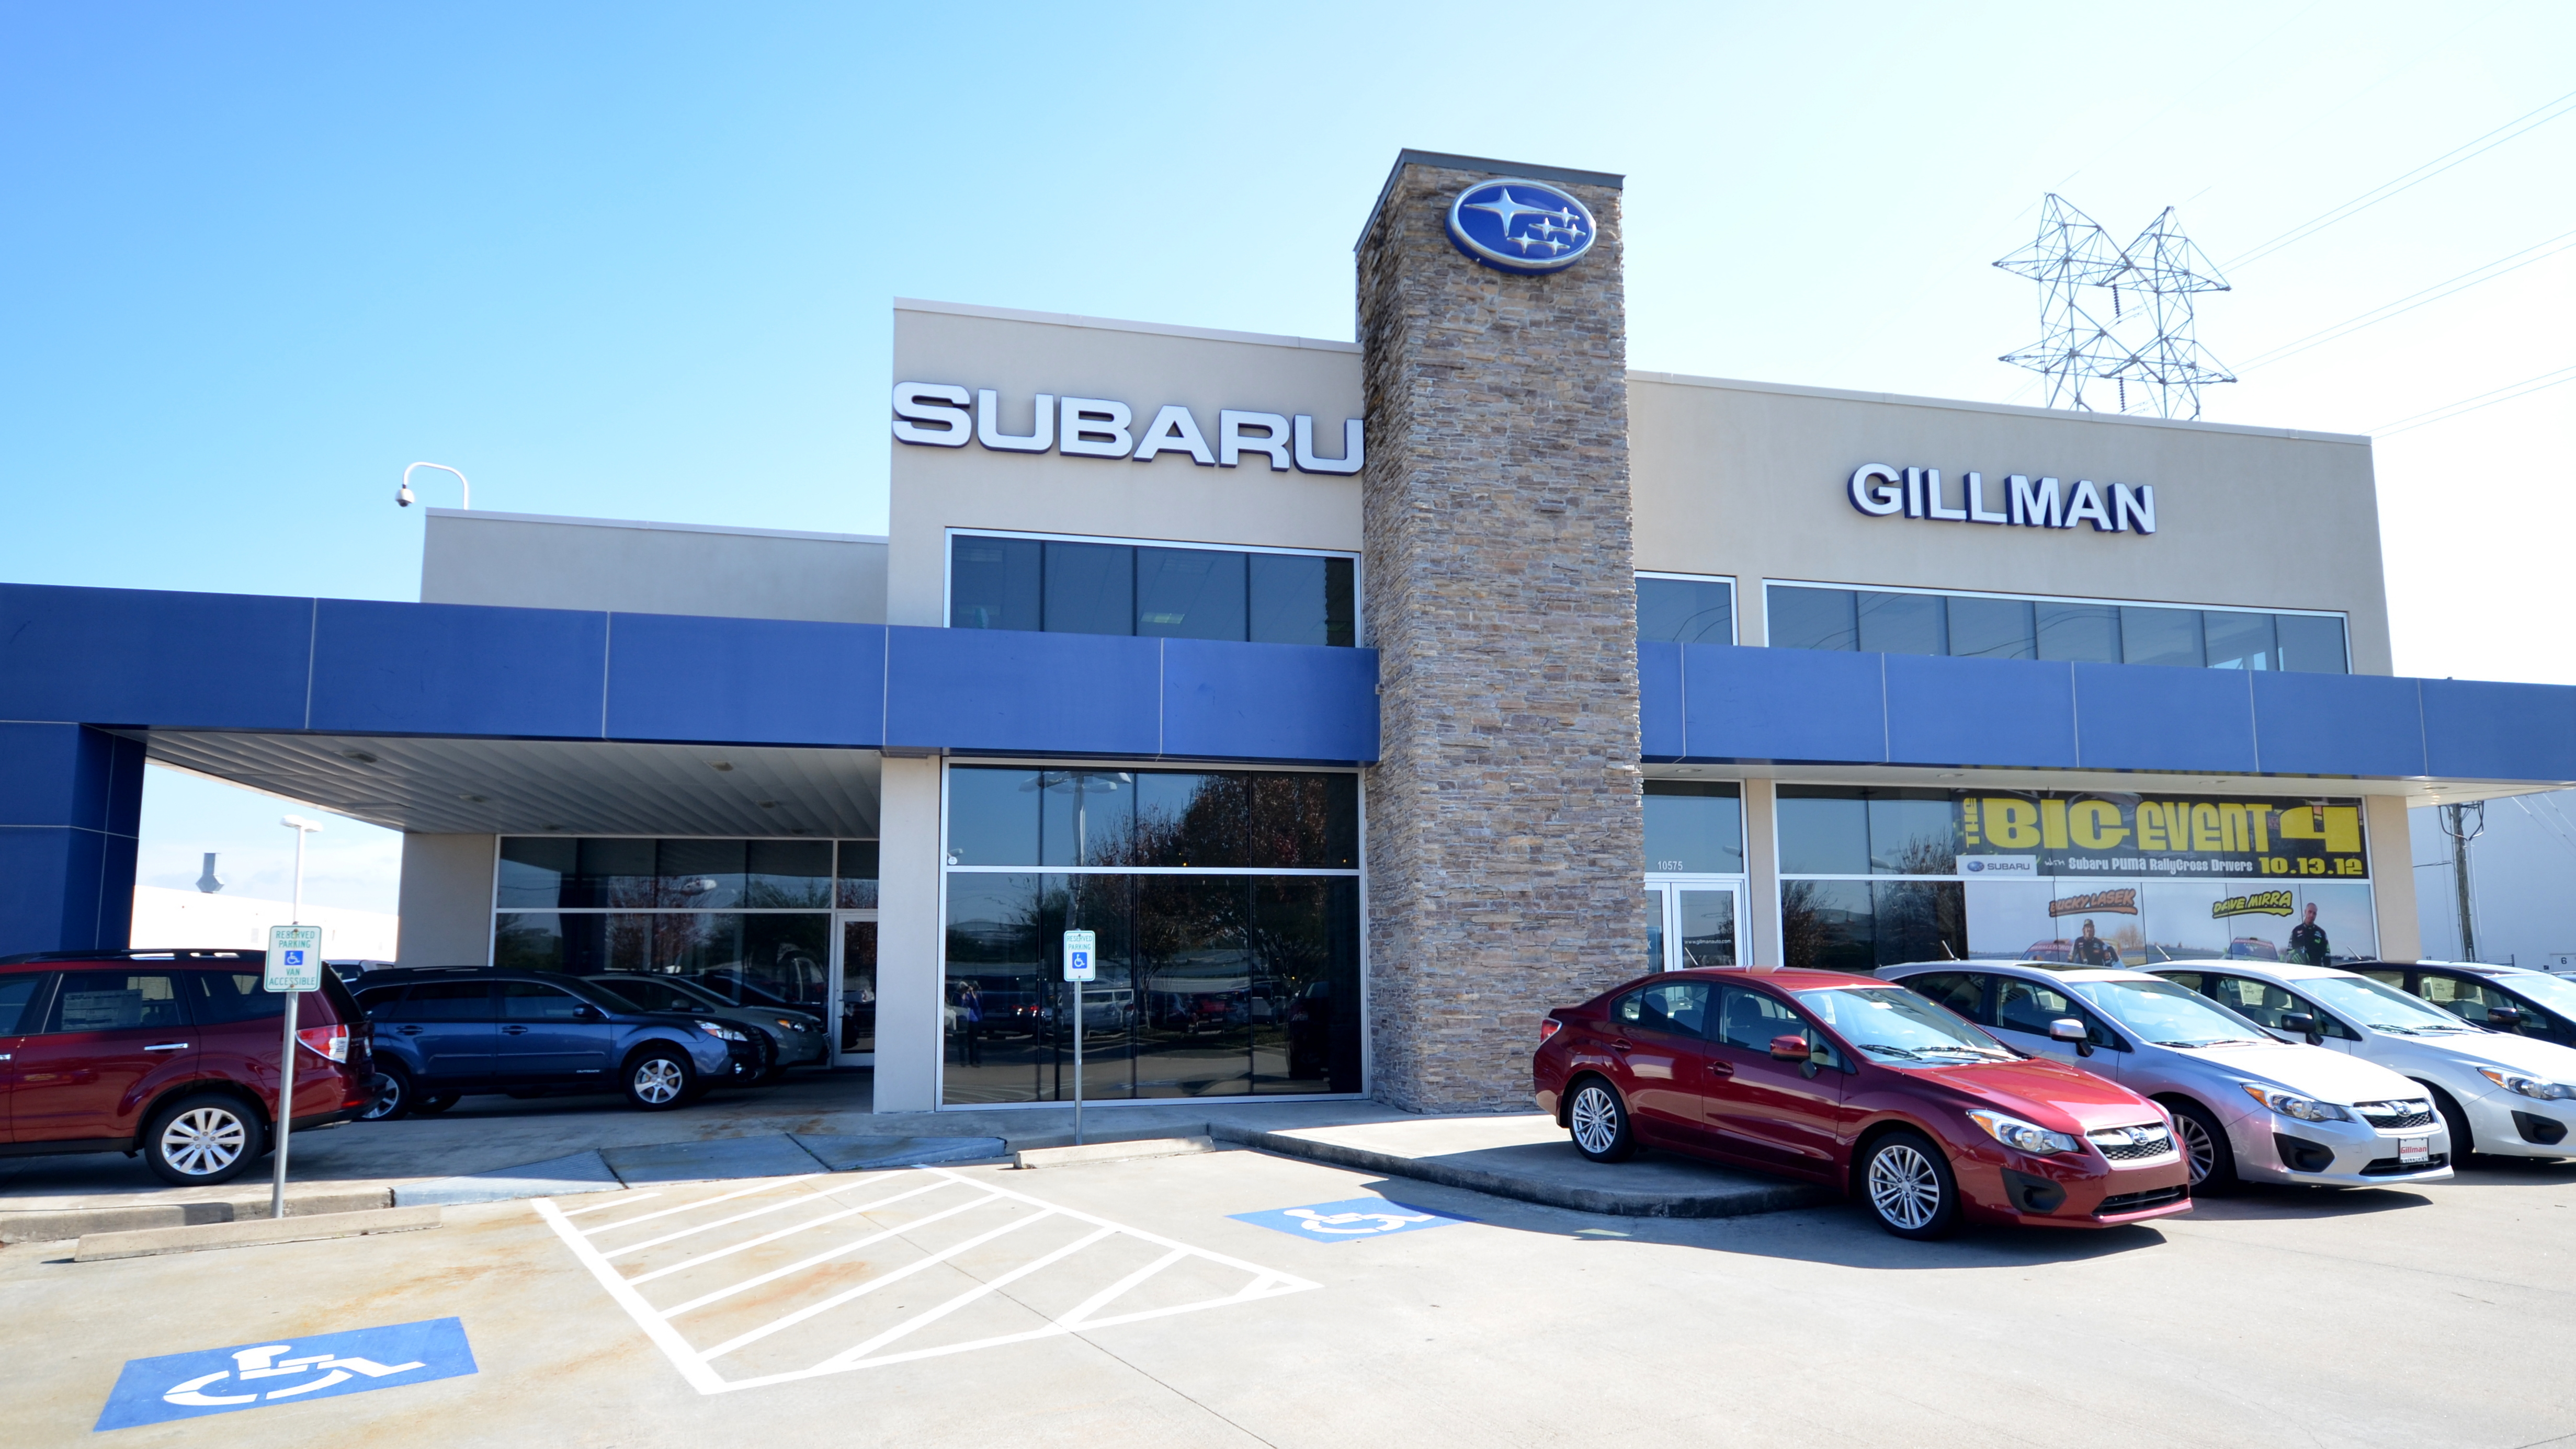 Gillman Subaru